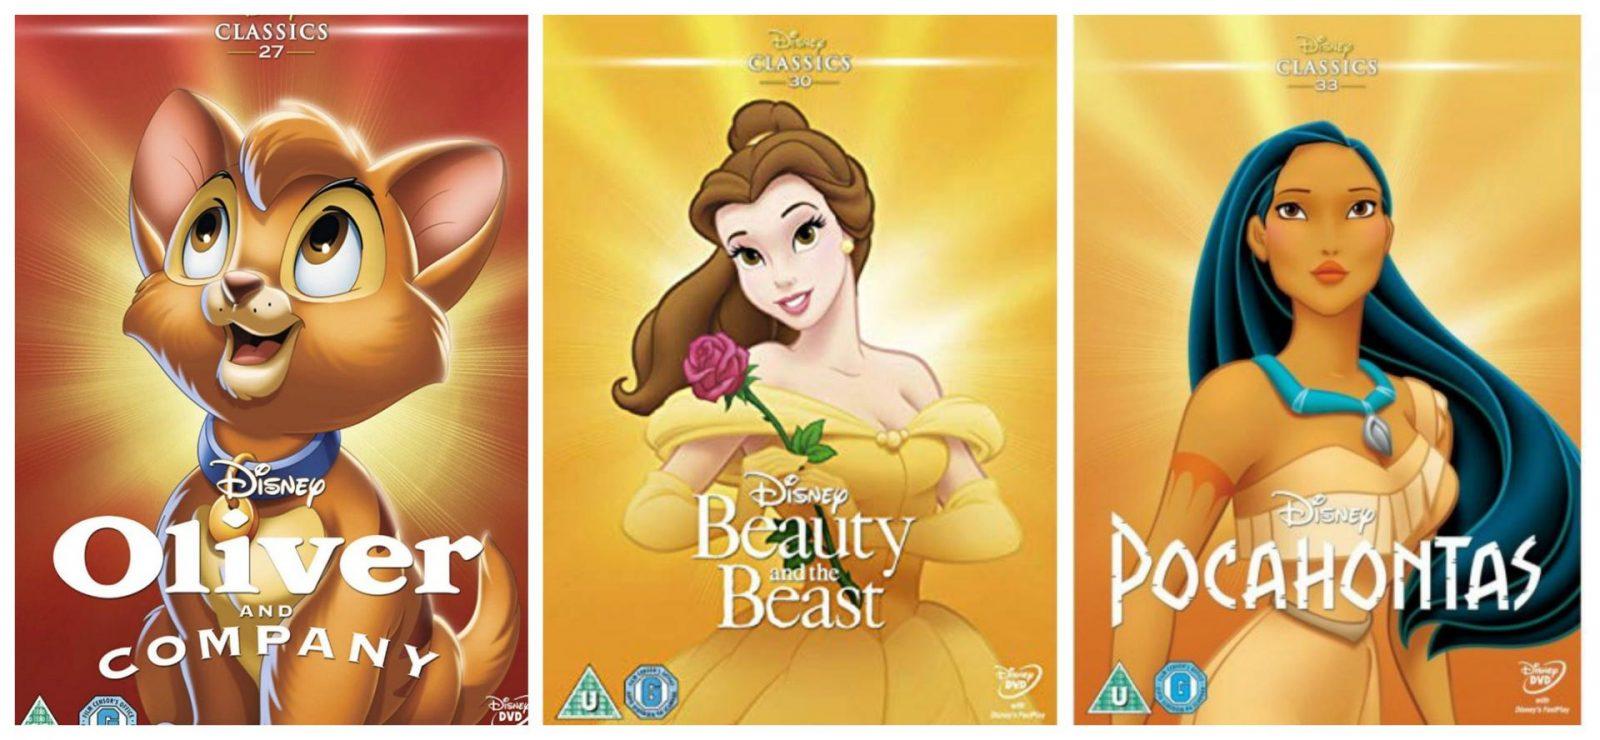 List of Disney Classics Films in Order - Charlotte Ruff